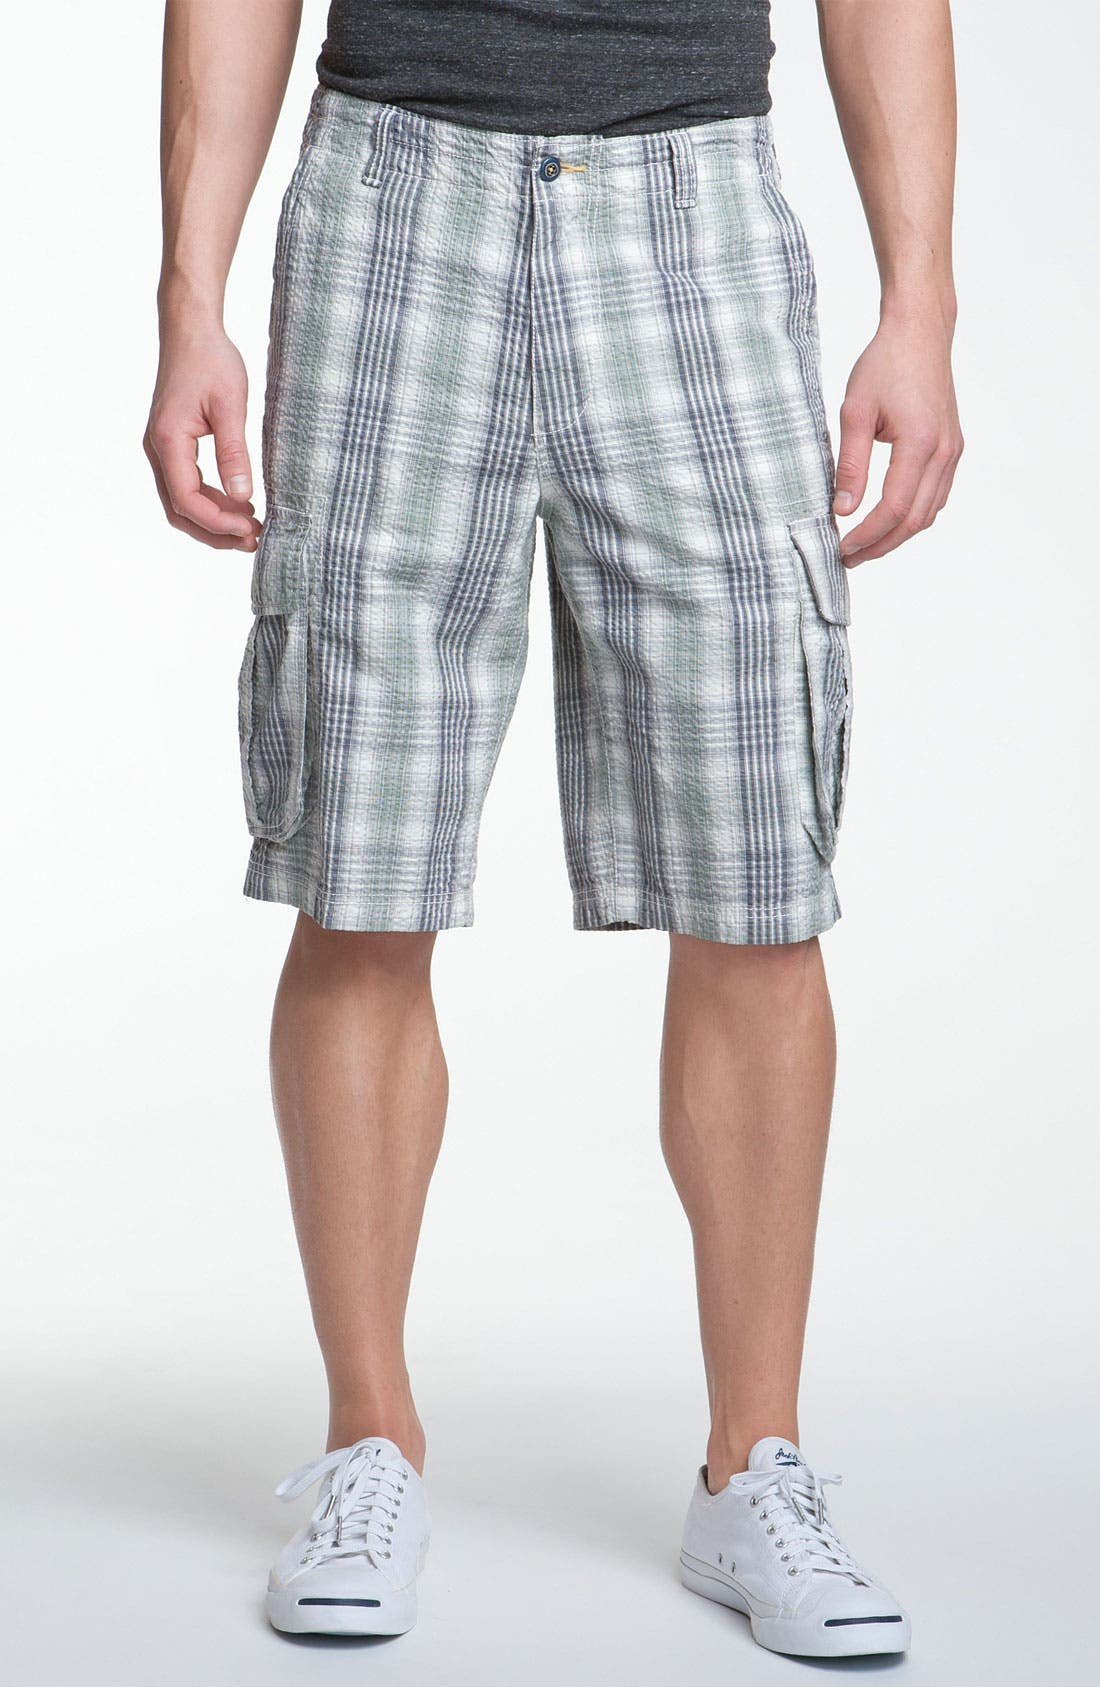 Alternate Image 1 Selected - Tommy Bahama 'Seer Genius' Cargo Shorts